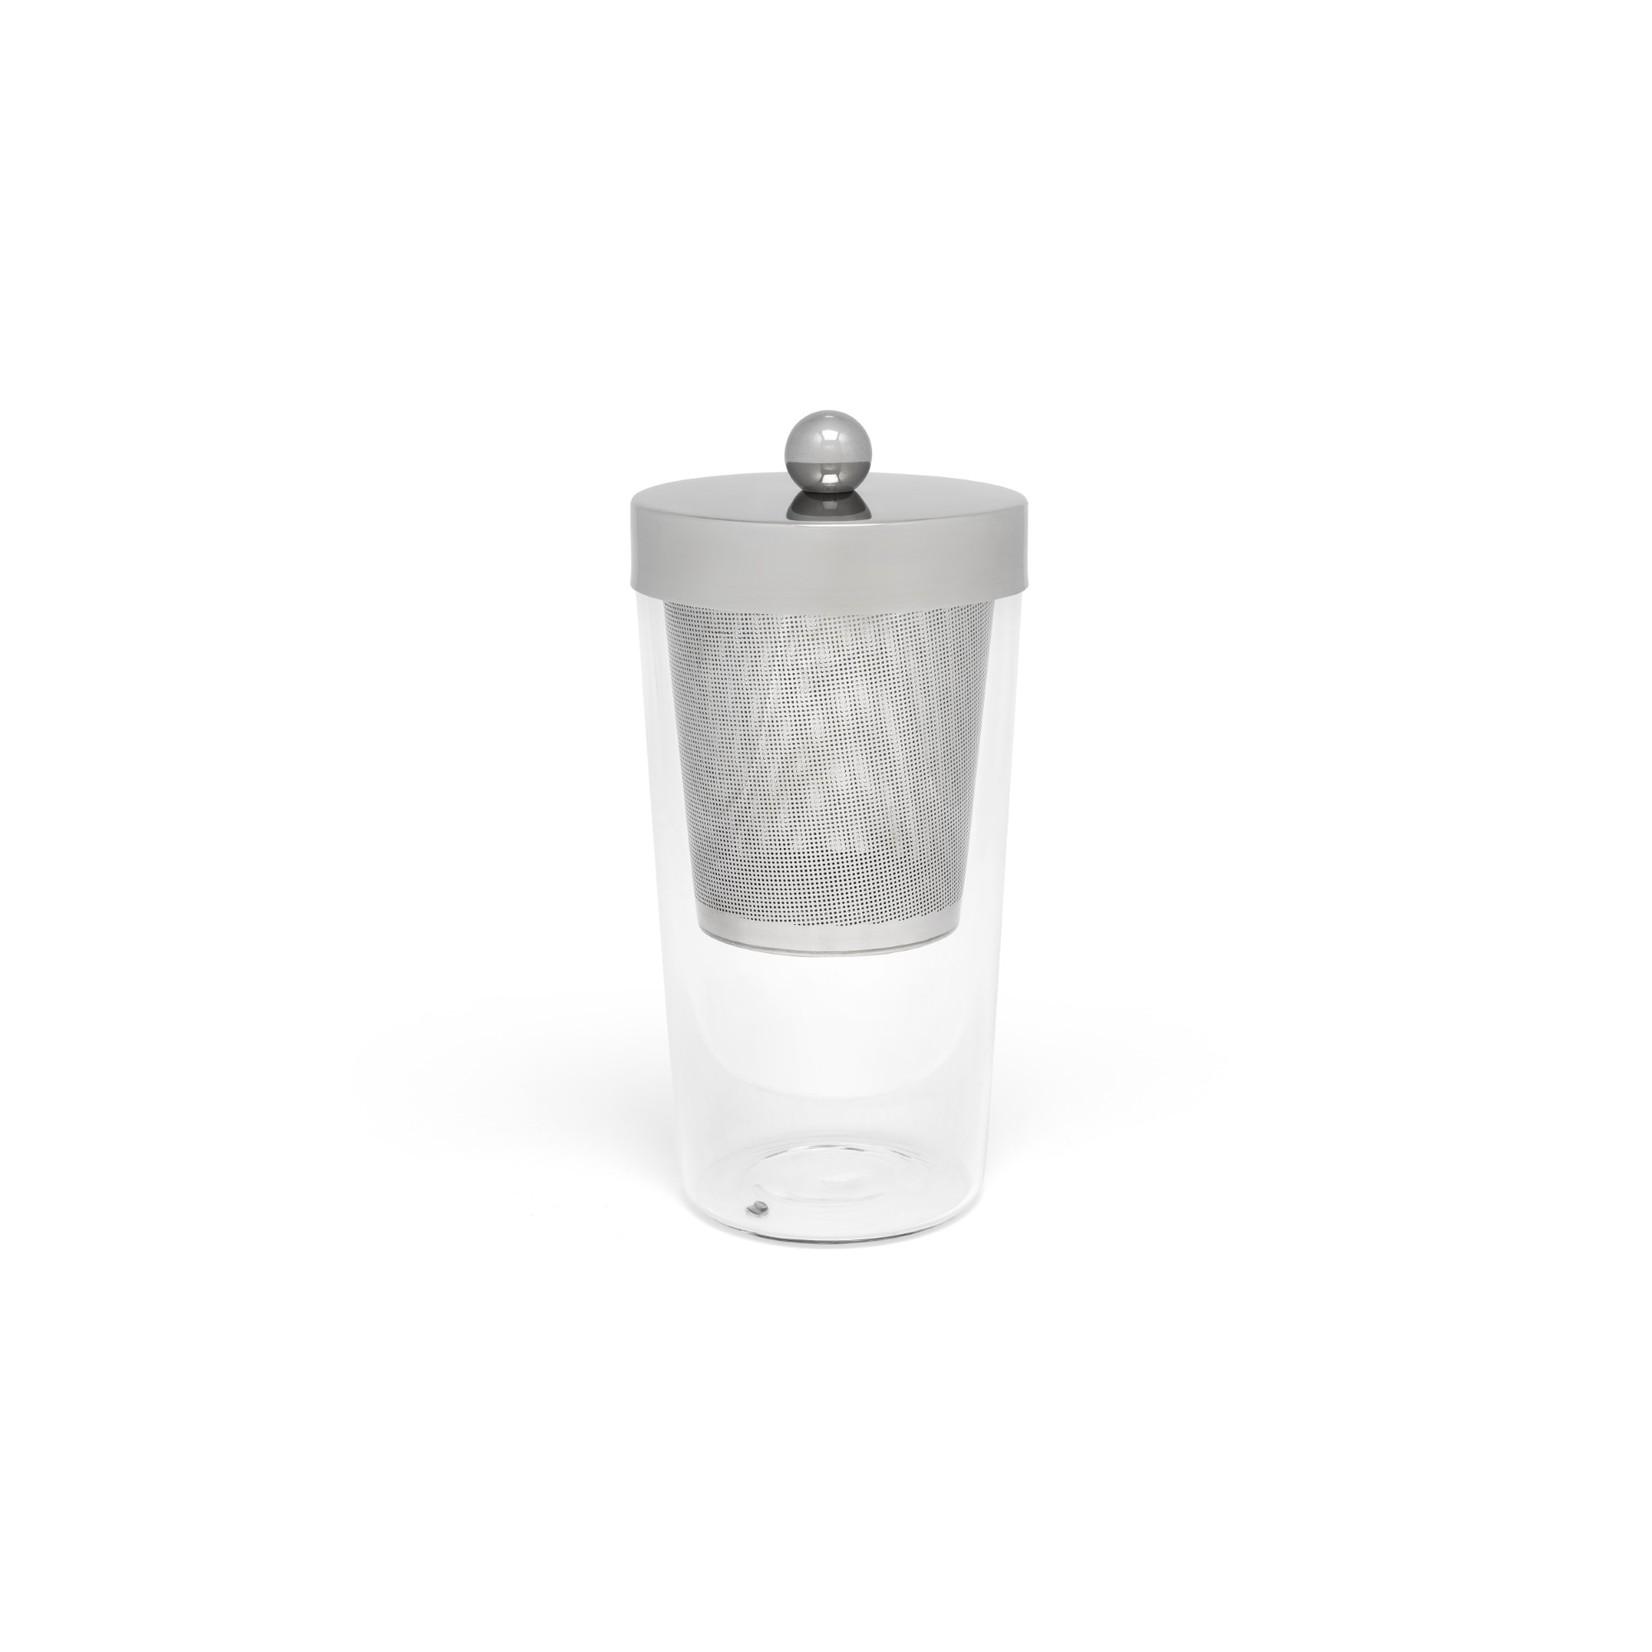 Bredemeijer Bredemeijer Theepot Tea for one Lucca dubbelwandig glas RVS filter en deksel, 200ml